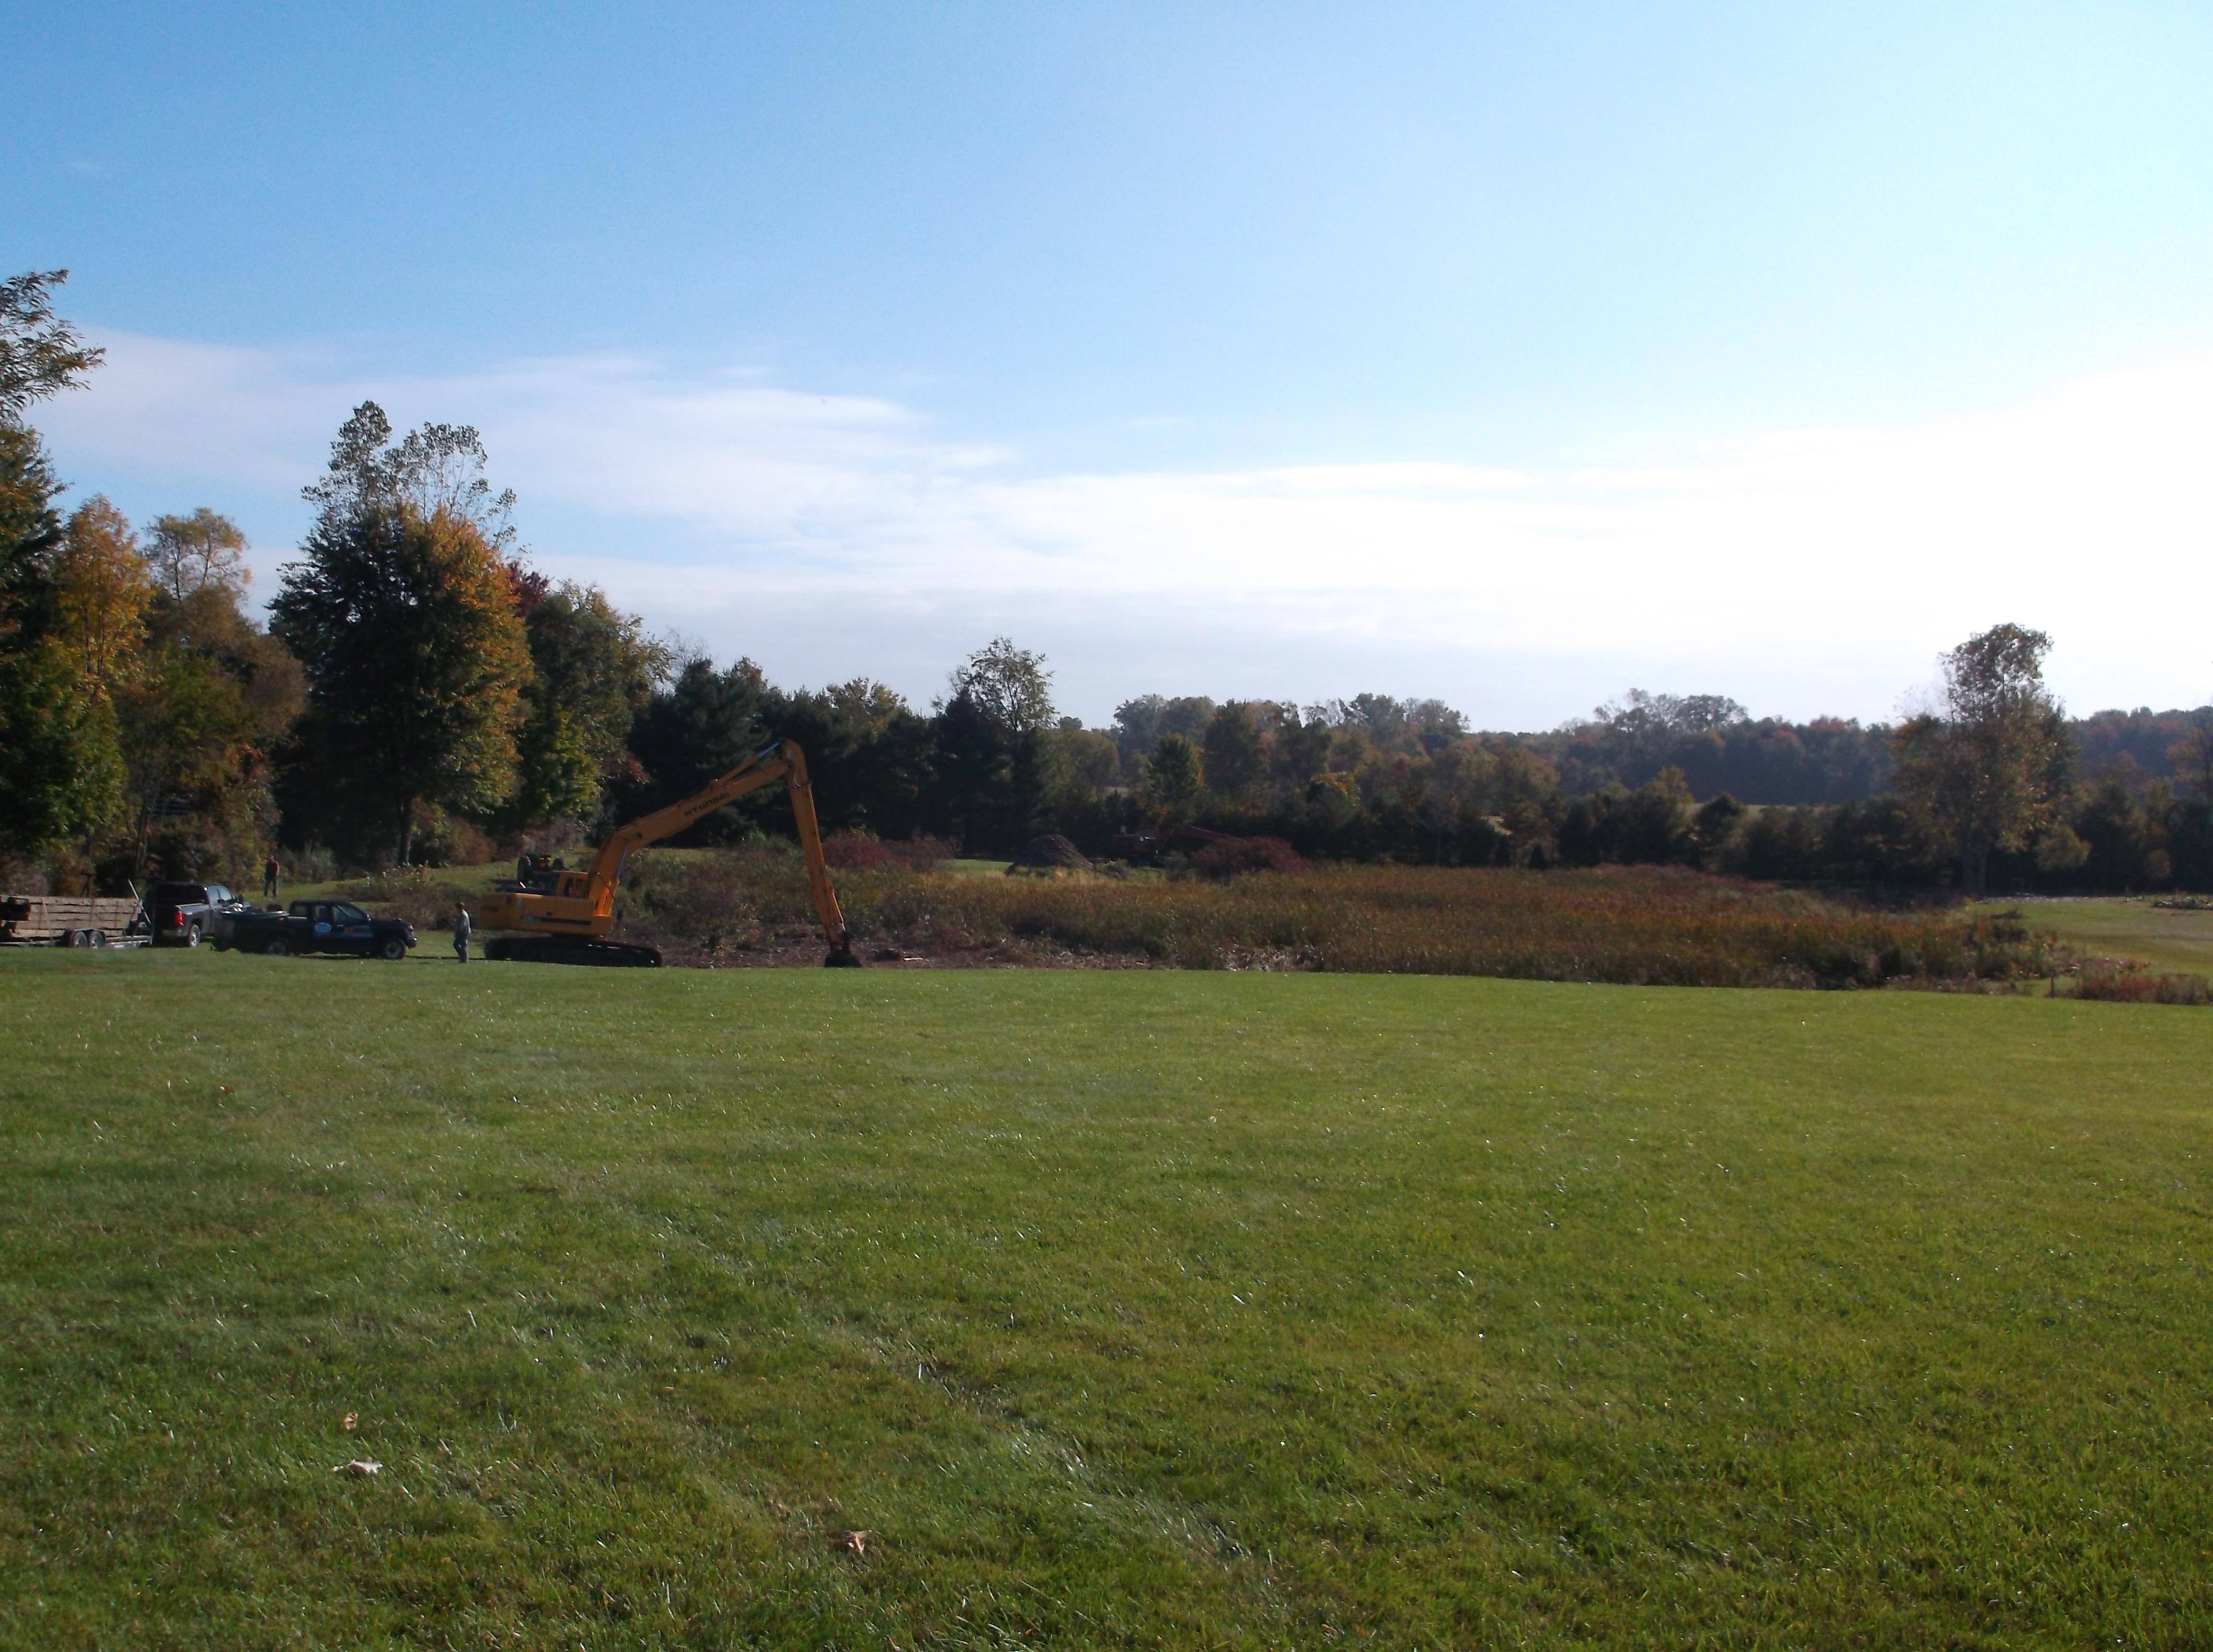 fish_pond_excavation_Plymouth_Michigan_18.jpg